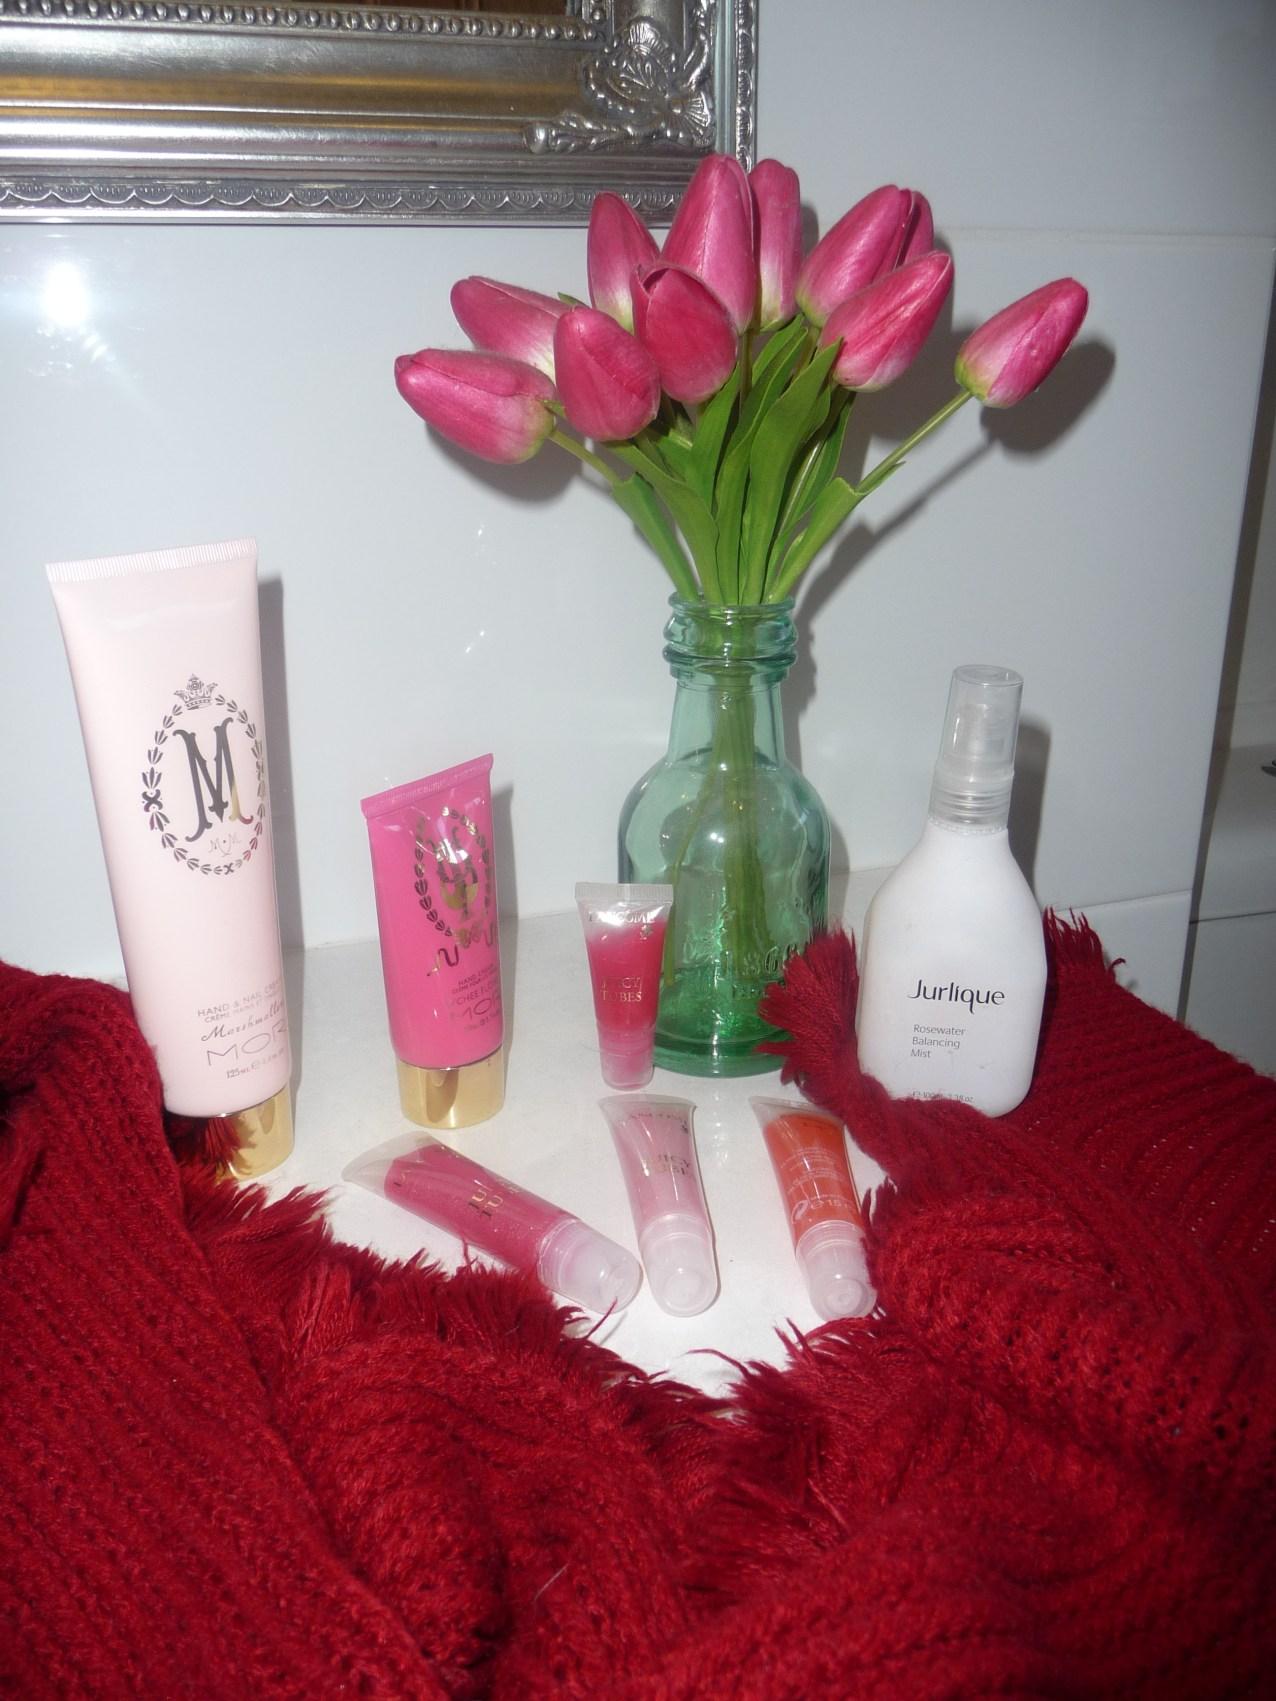 Travel essentials including red pashmina/scarf